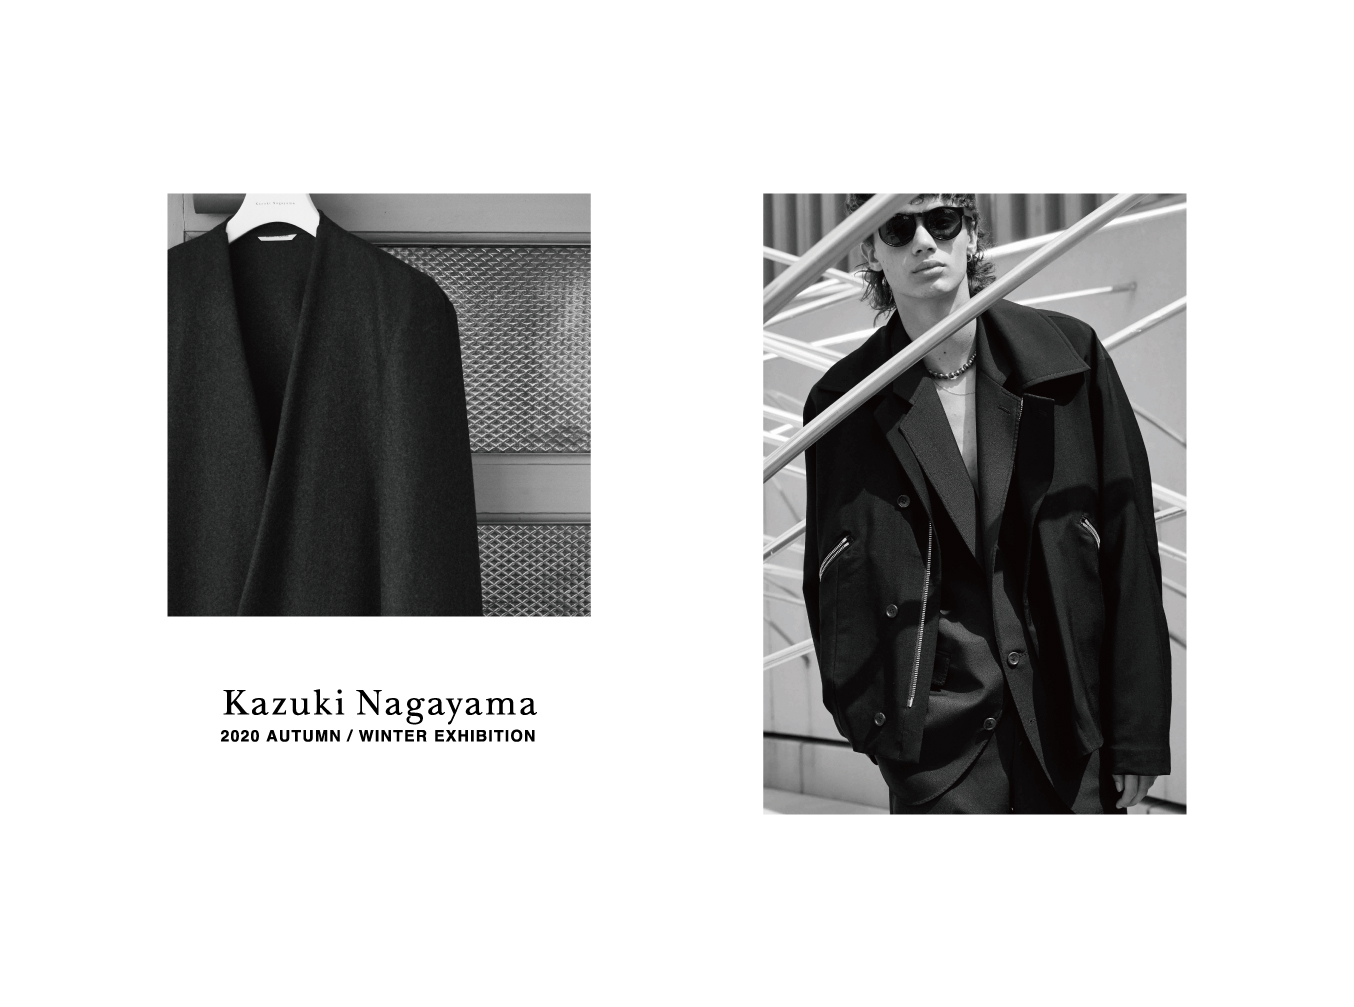 Kazuki Nagayama 2020 AUTUMN/WINTER EXHIBITION